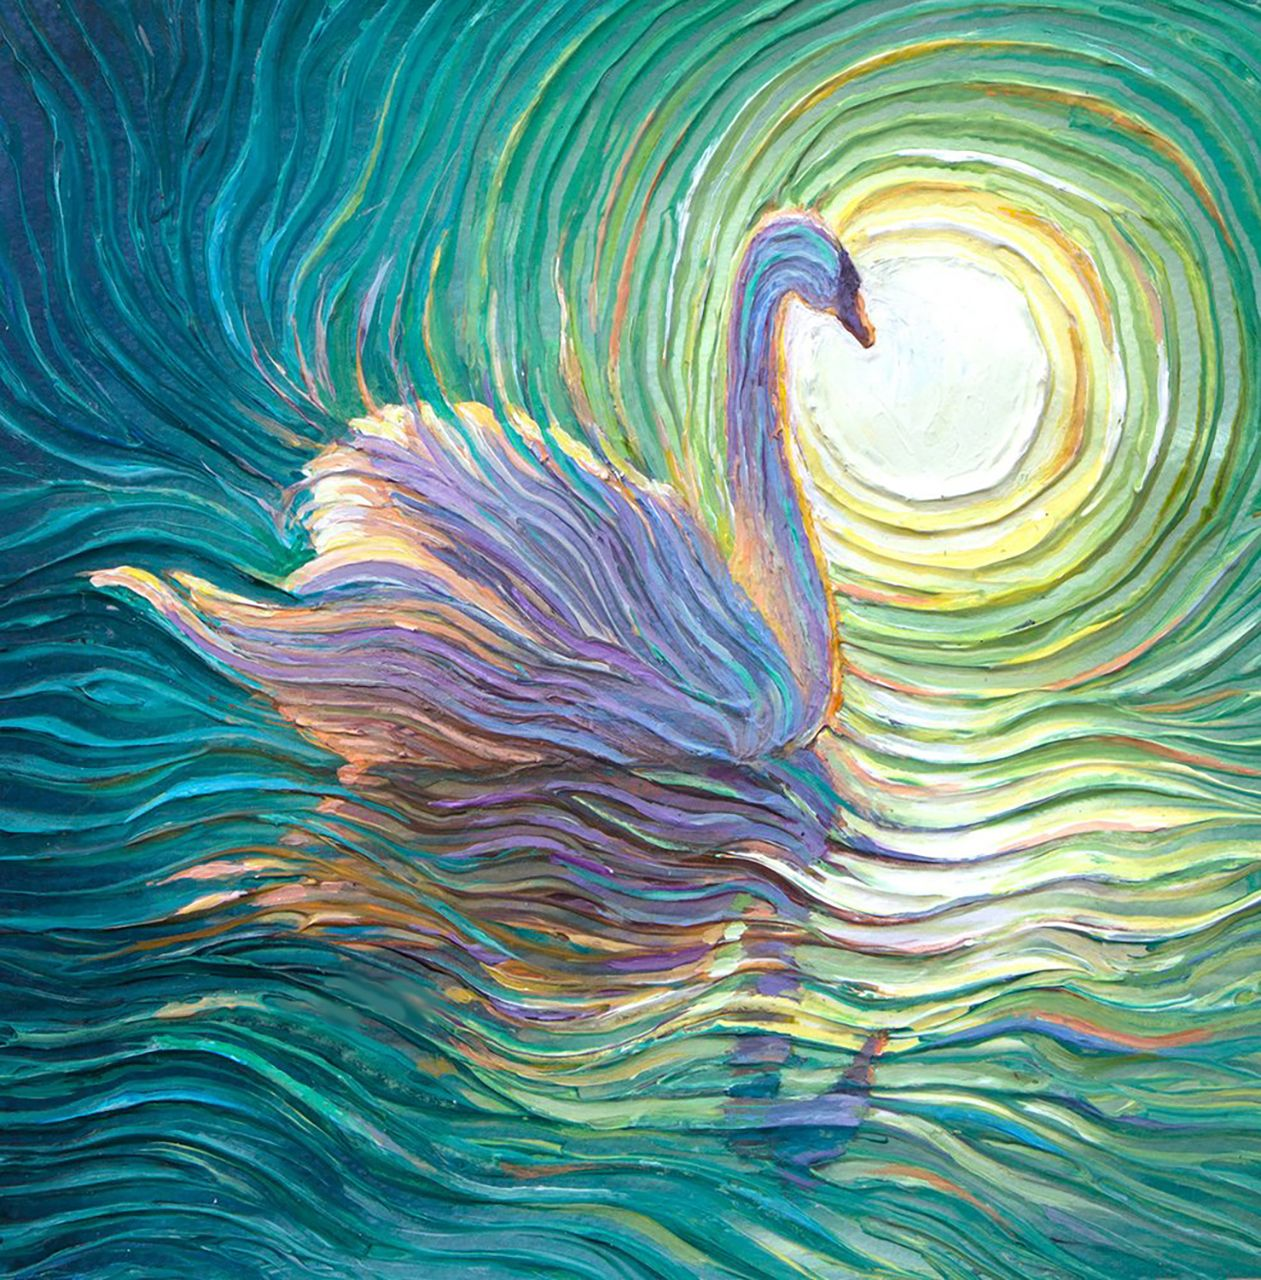 Swan Oil Painting Giclee Print